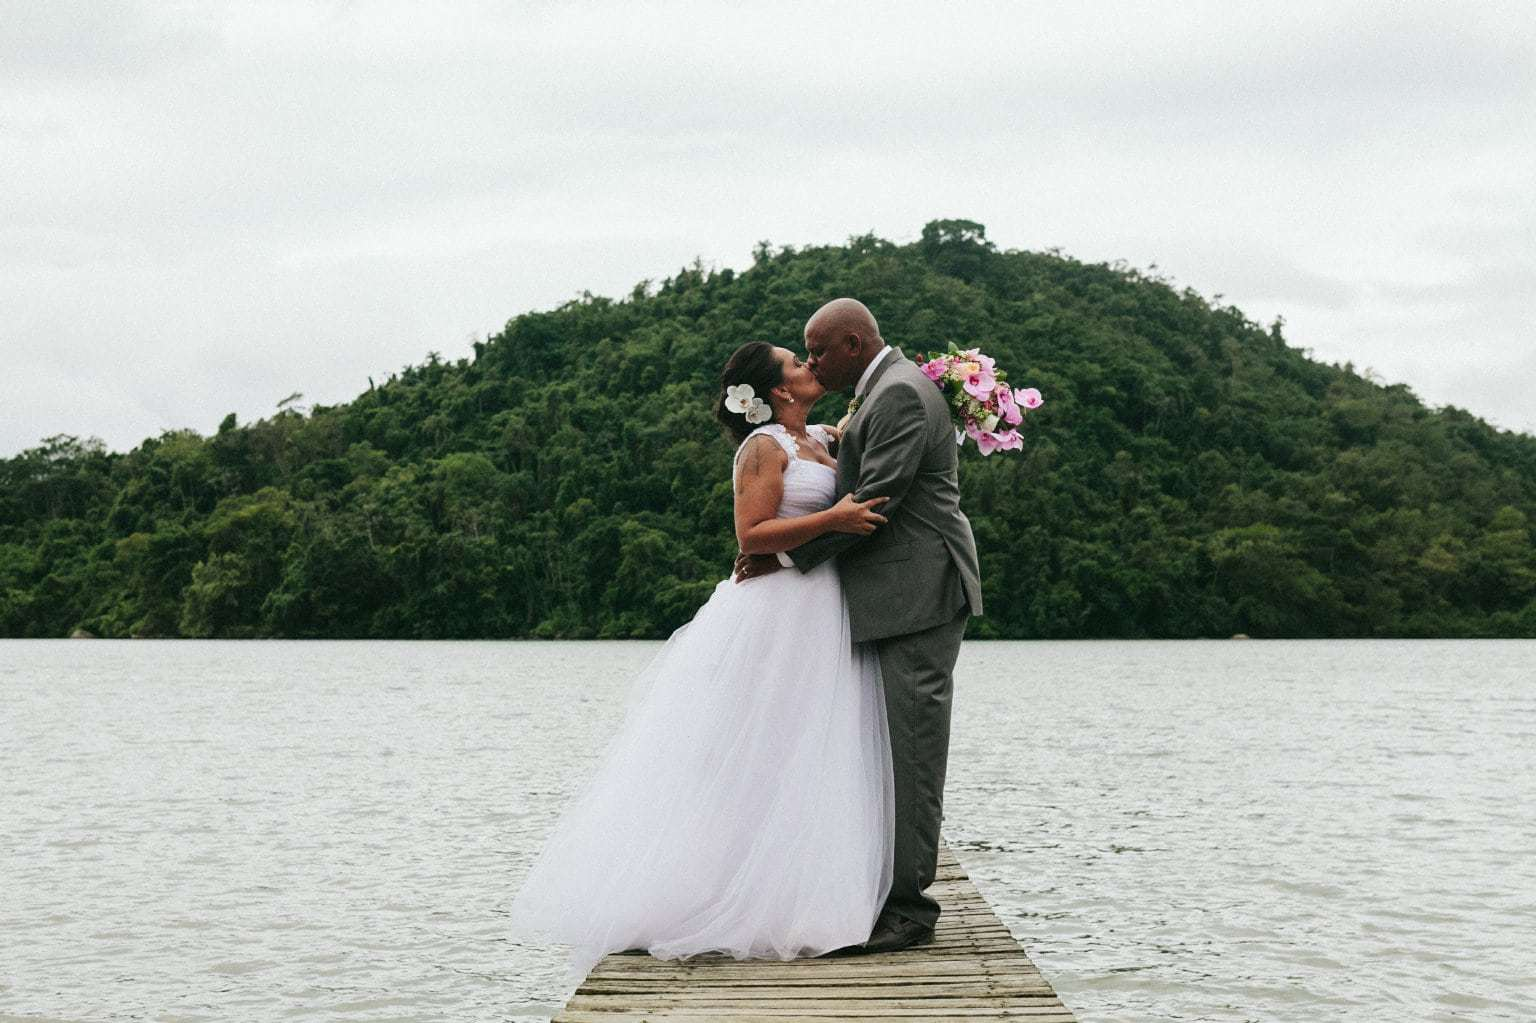 casamento-karina-e-marcos-felizes-para-sempre-caseme-33